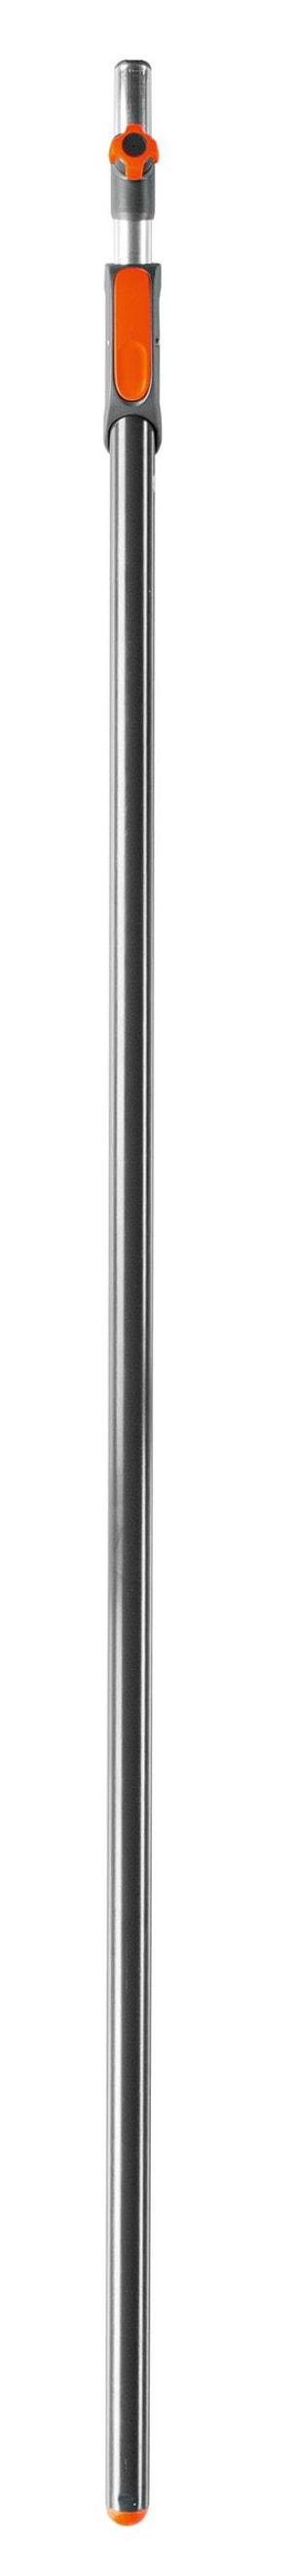 Combisystem 160 - 290 cm